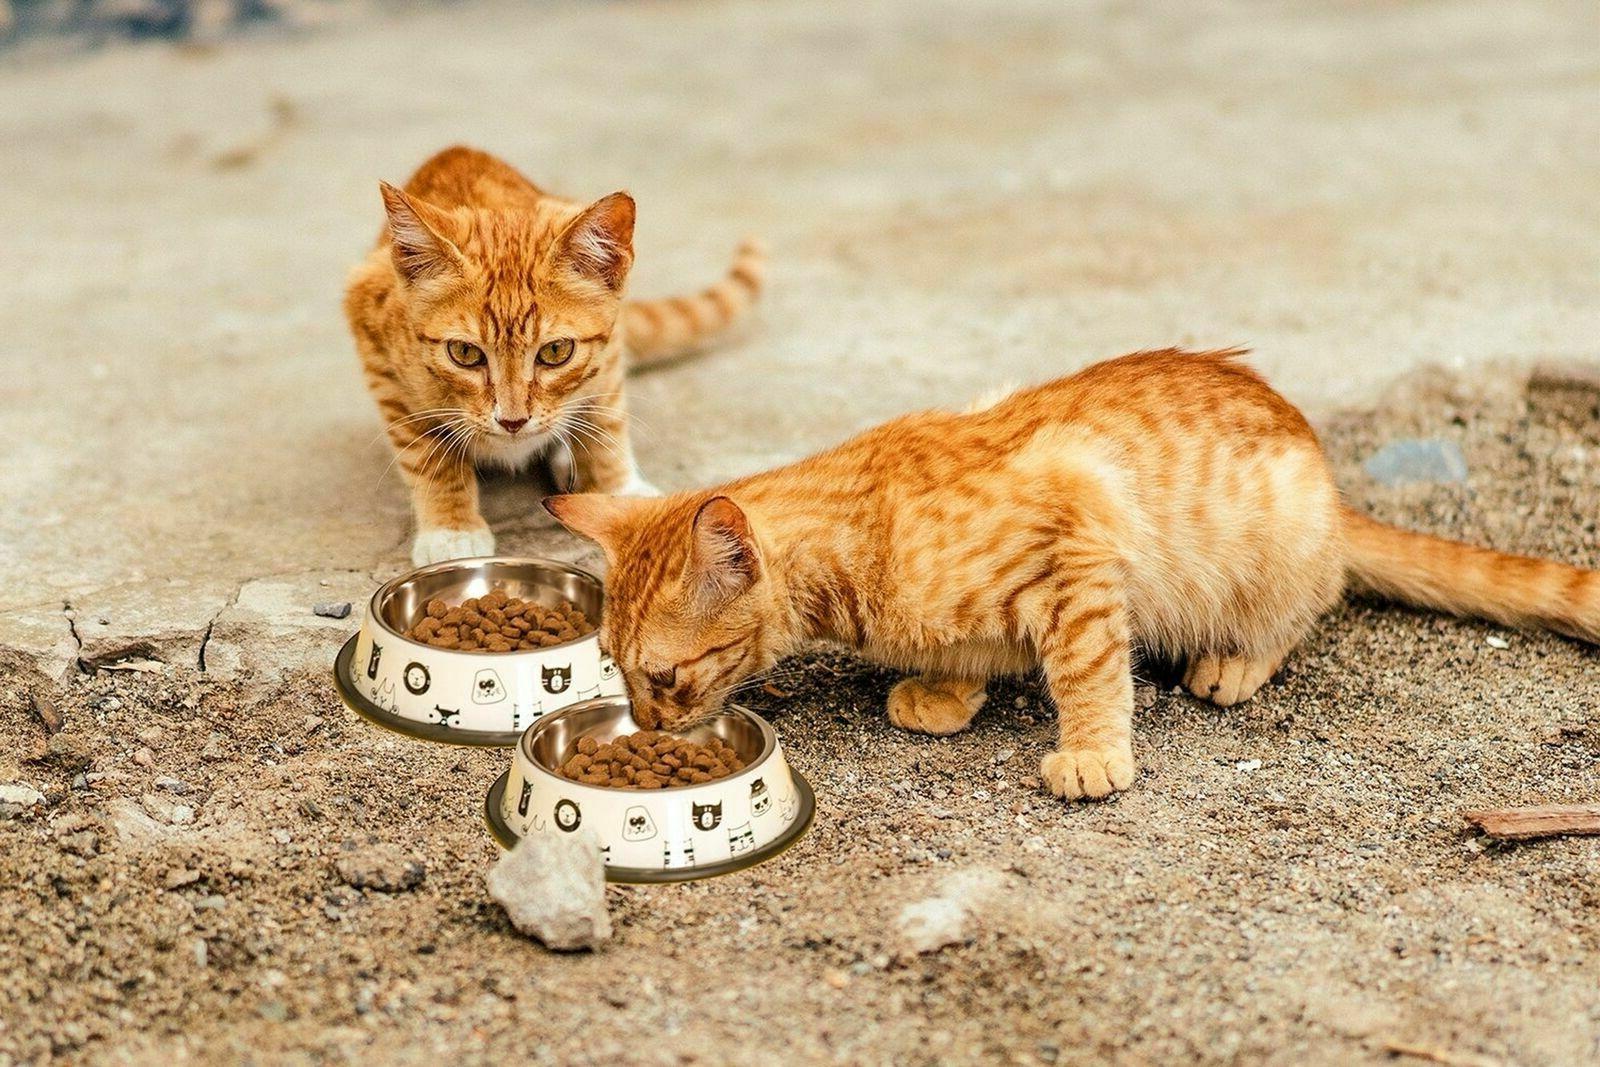 Cat Bowl Includes Bowls, Toys 1